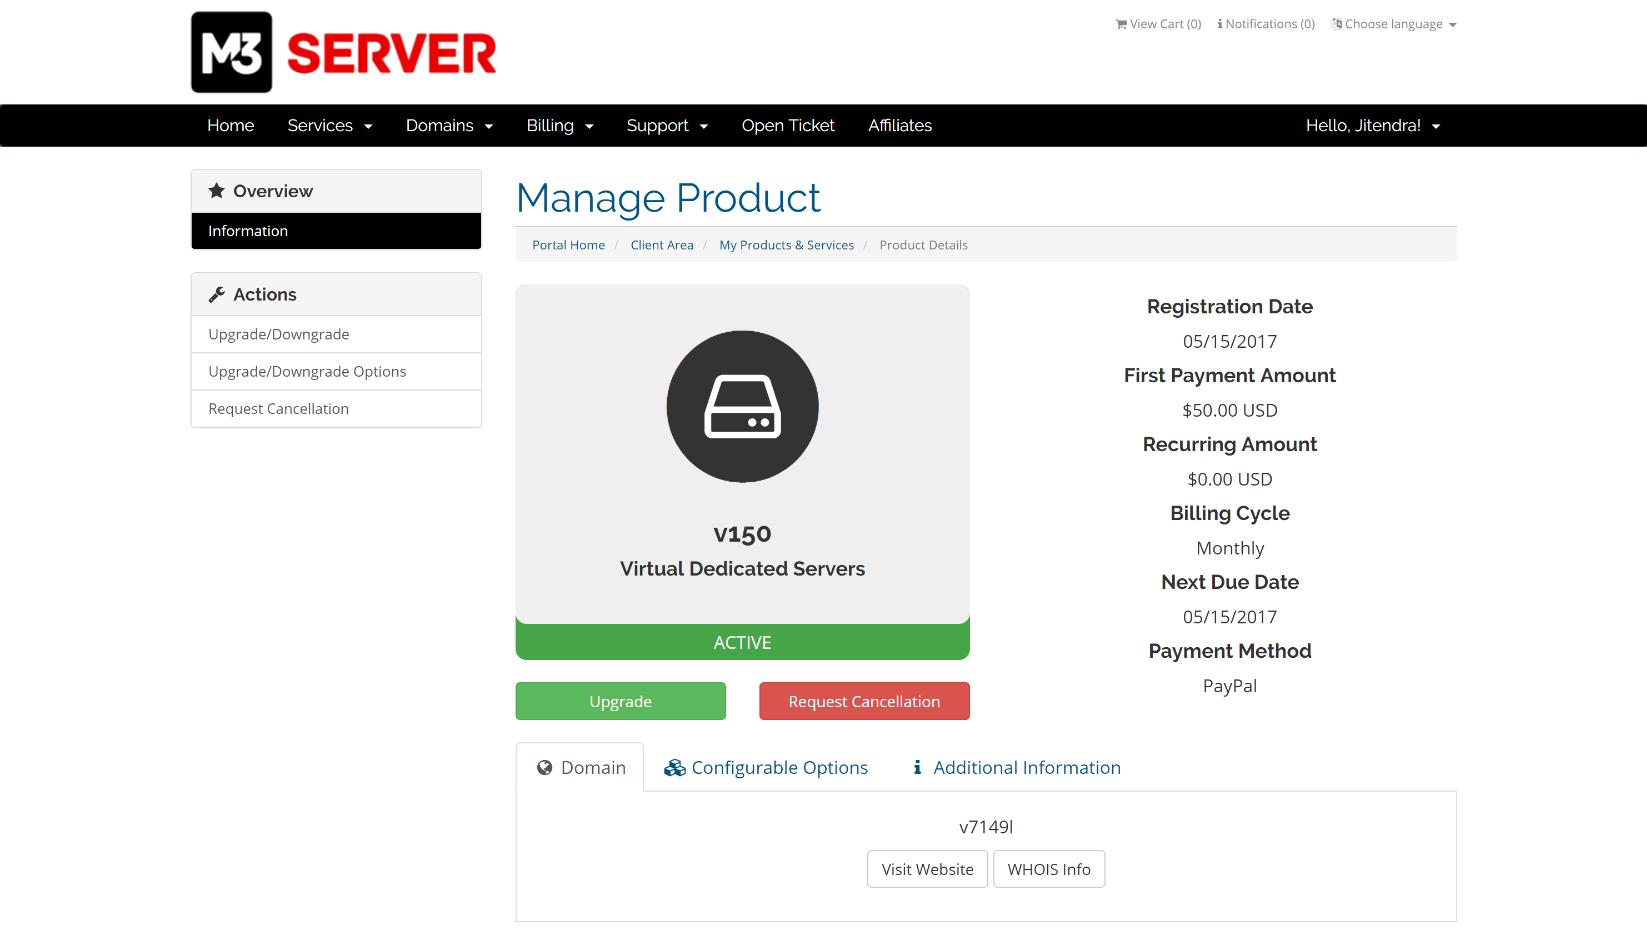 m3server services dashboard